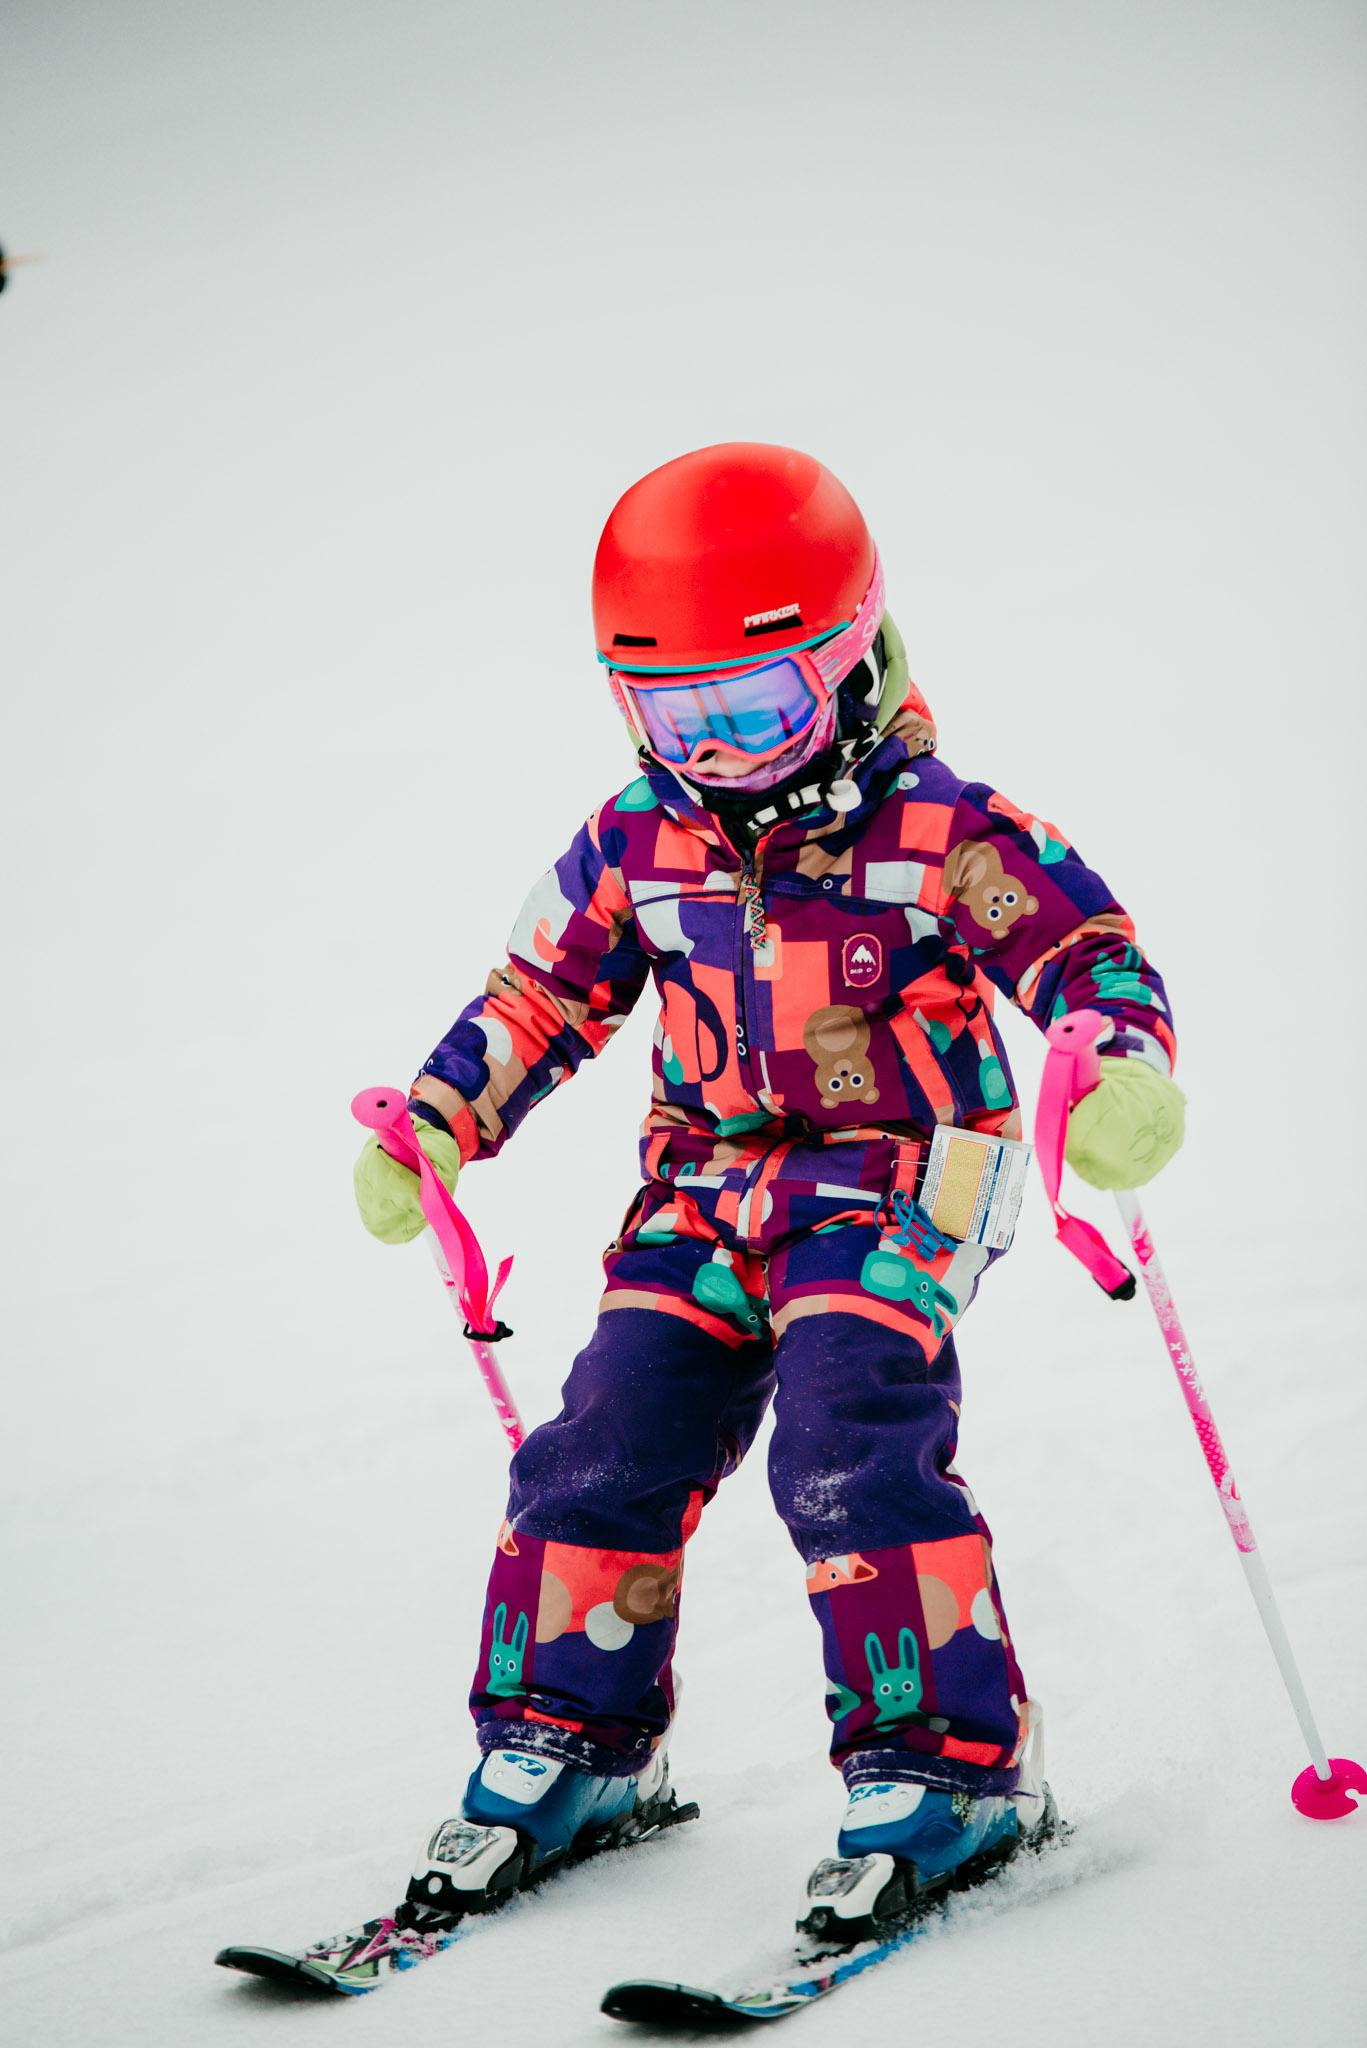 Chelsea Czibere - January 19, 2018 - Nakiska Ski Resort-24.jpg